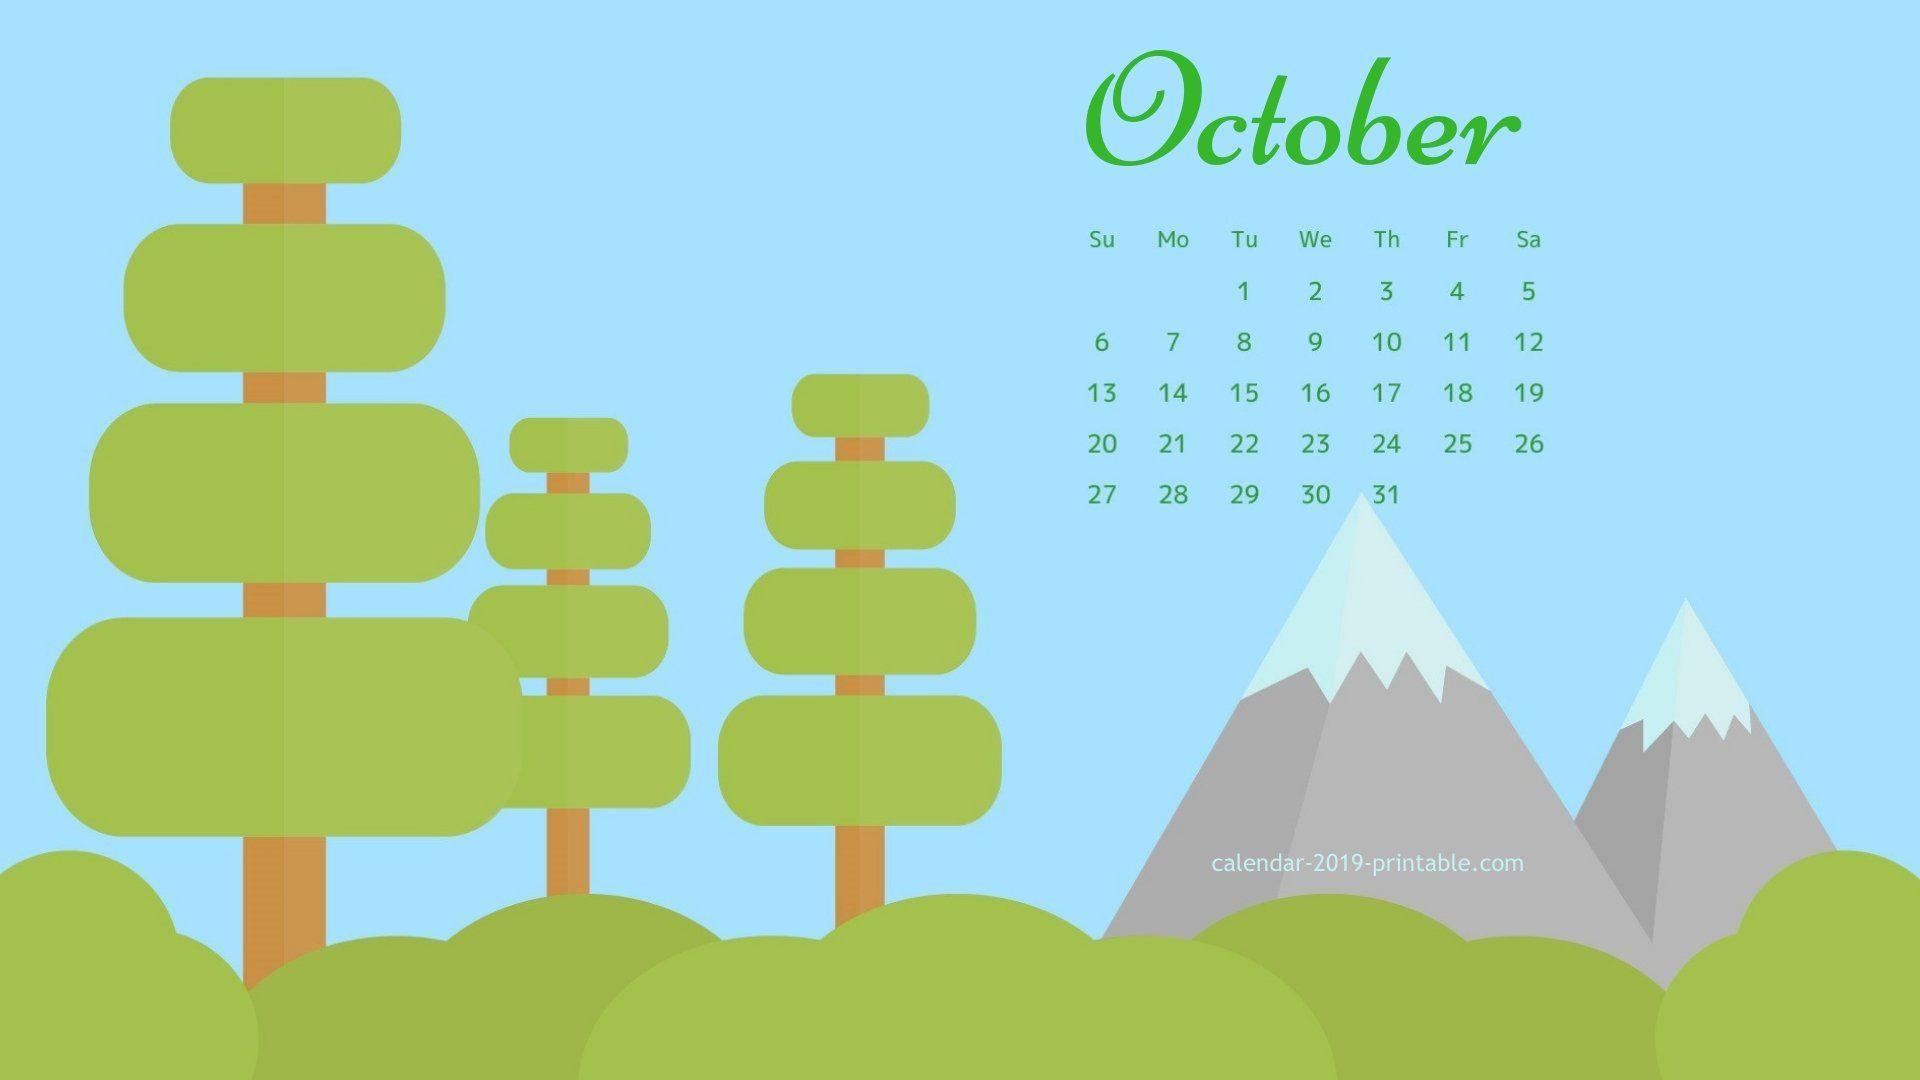 October 2019 Screensaver Background Calendar